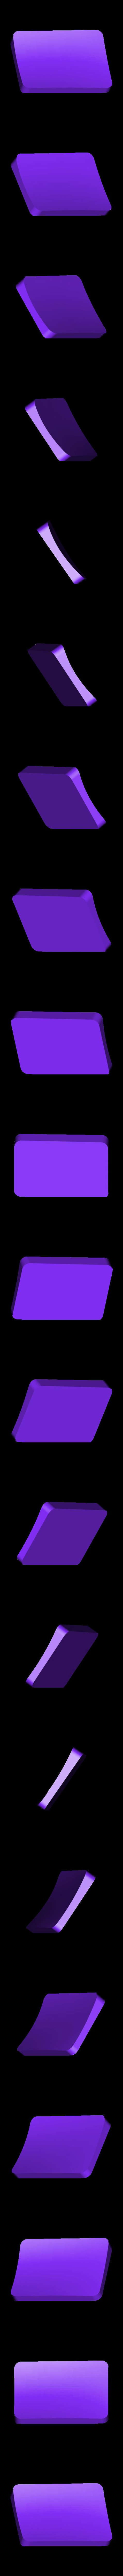 robo3D_red.STL Download free STL file Multi-Color Robo R2 USB Holder • 3D printer model, MosaicManufacturing